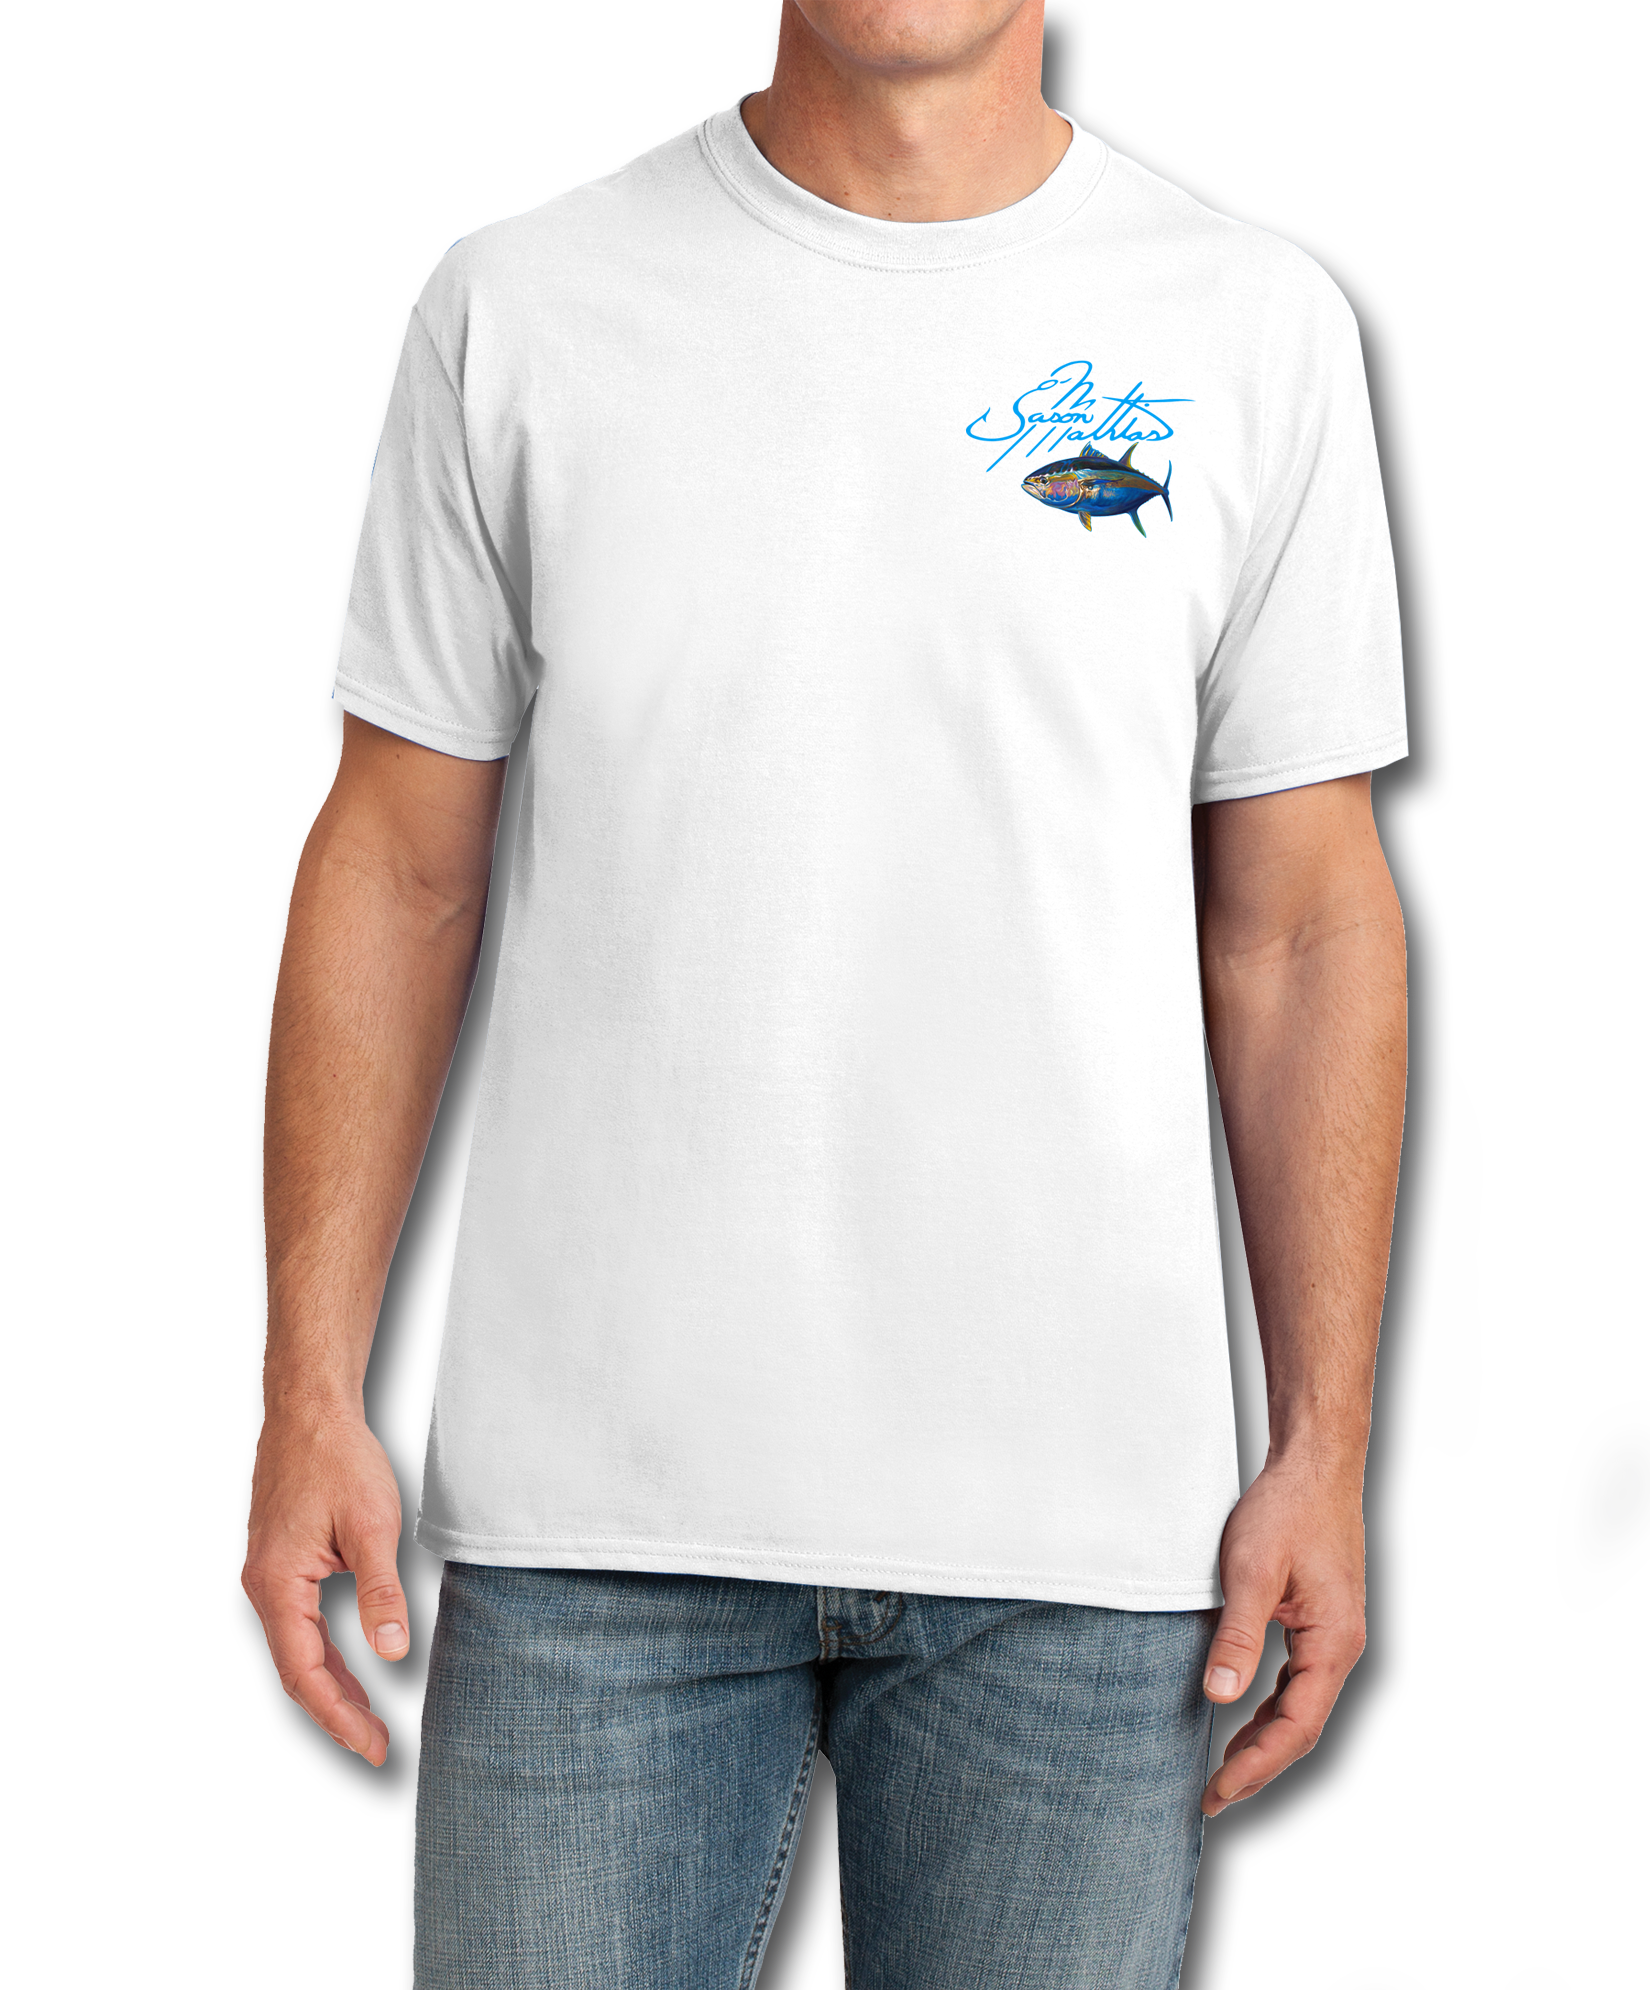 cotton-feel-t-shirt-white-jason-mathias-art-tuna.png